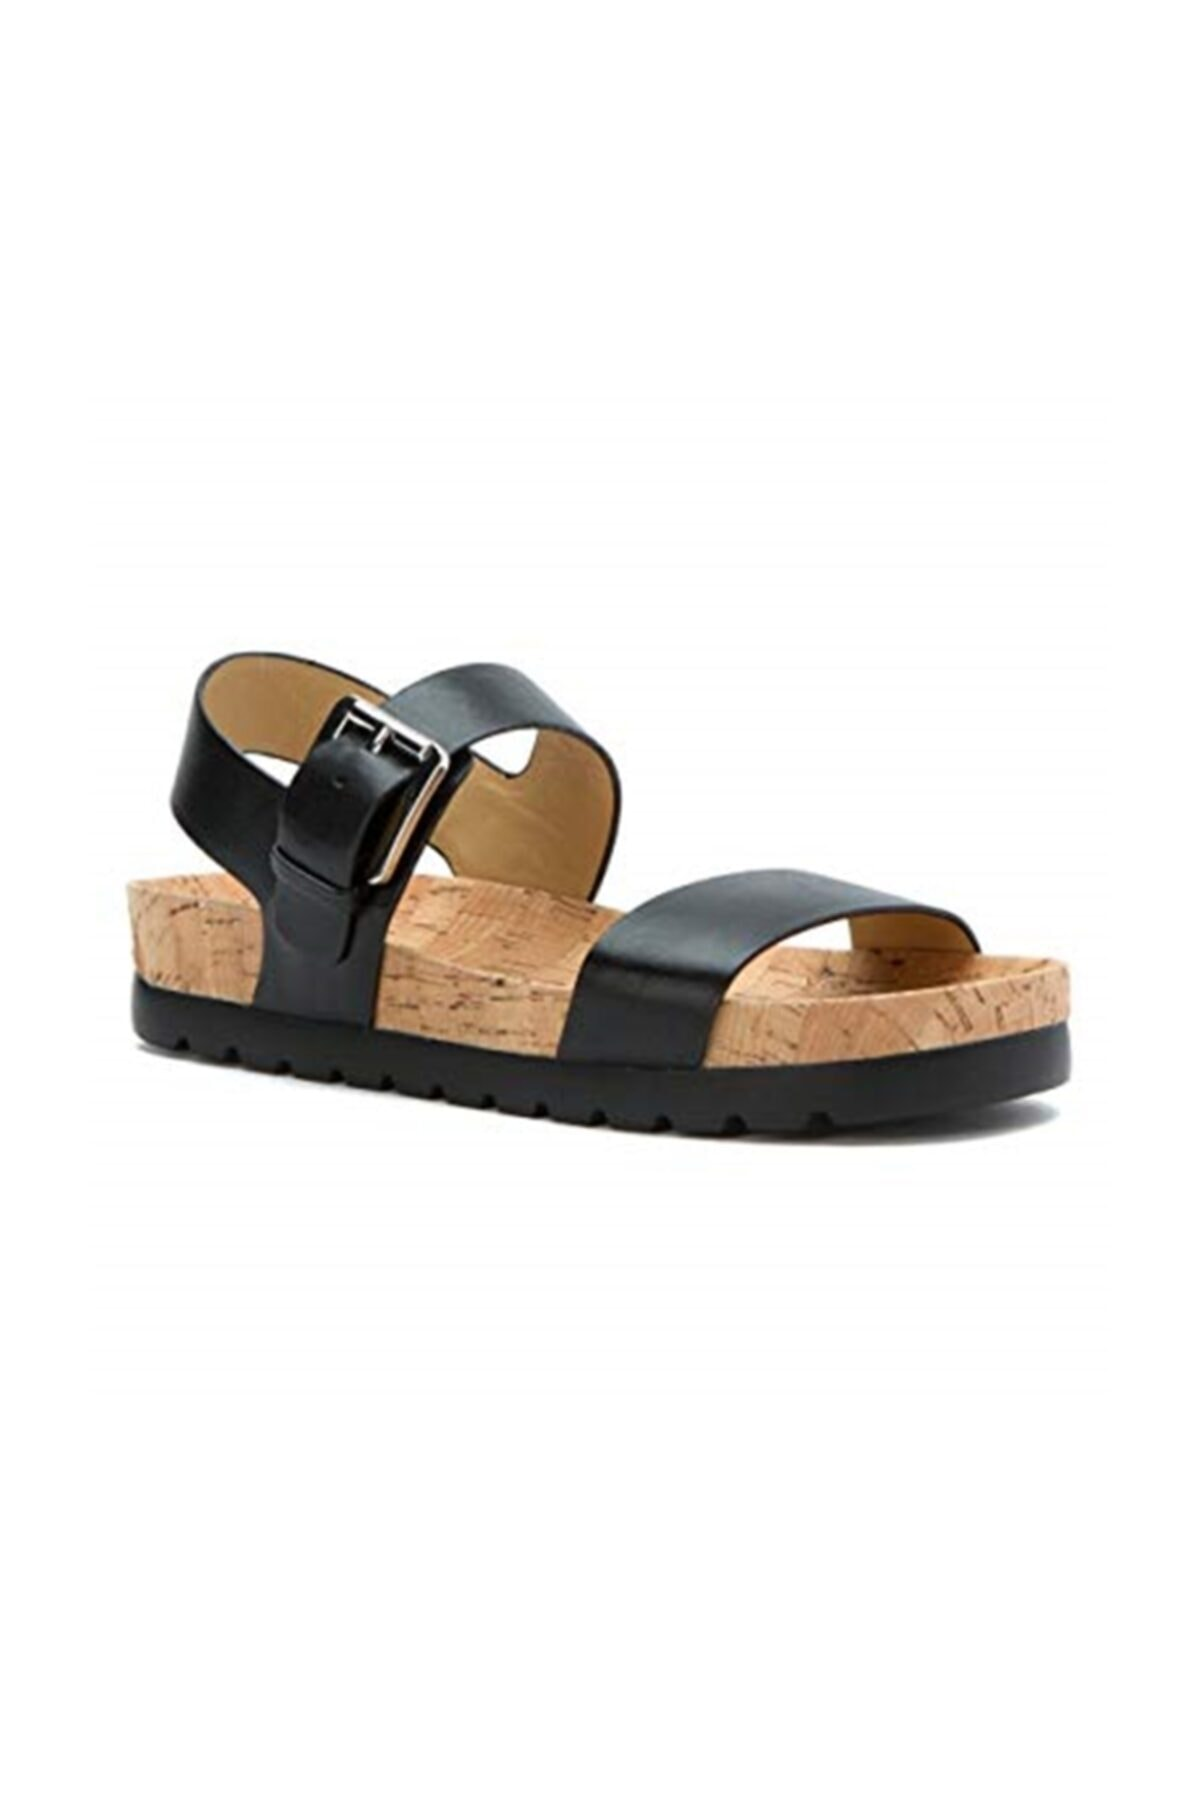 Michael Kors Judie Kadın  Sandalet Siyah 40s5jufaıl 1